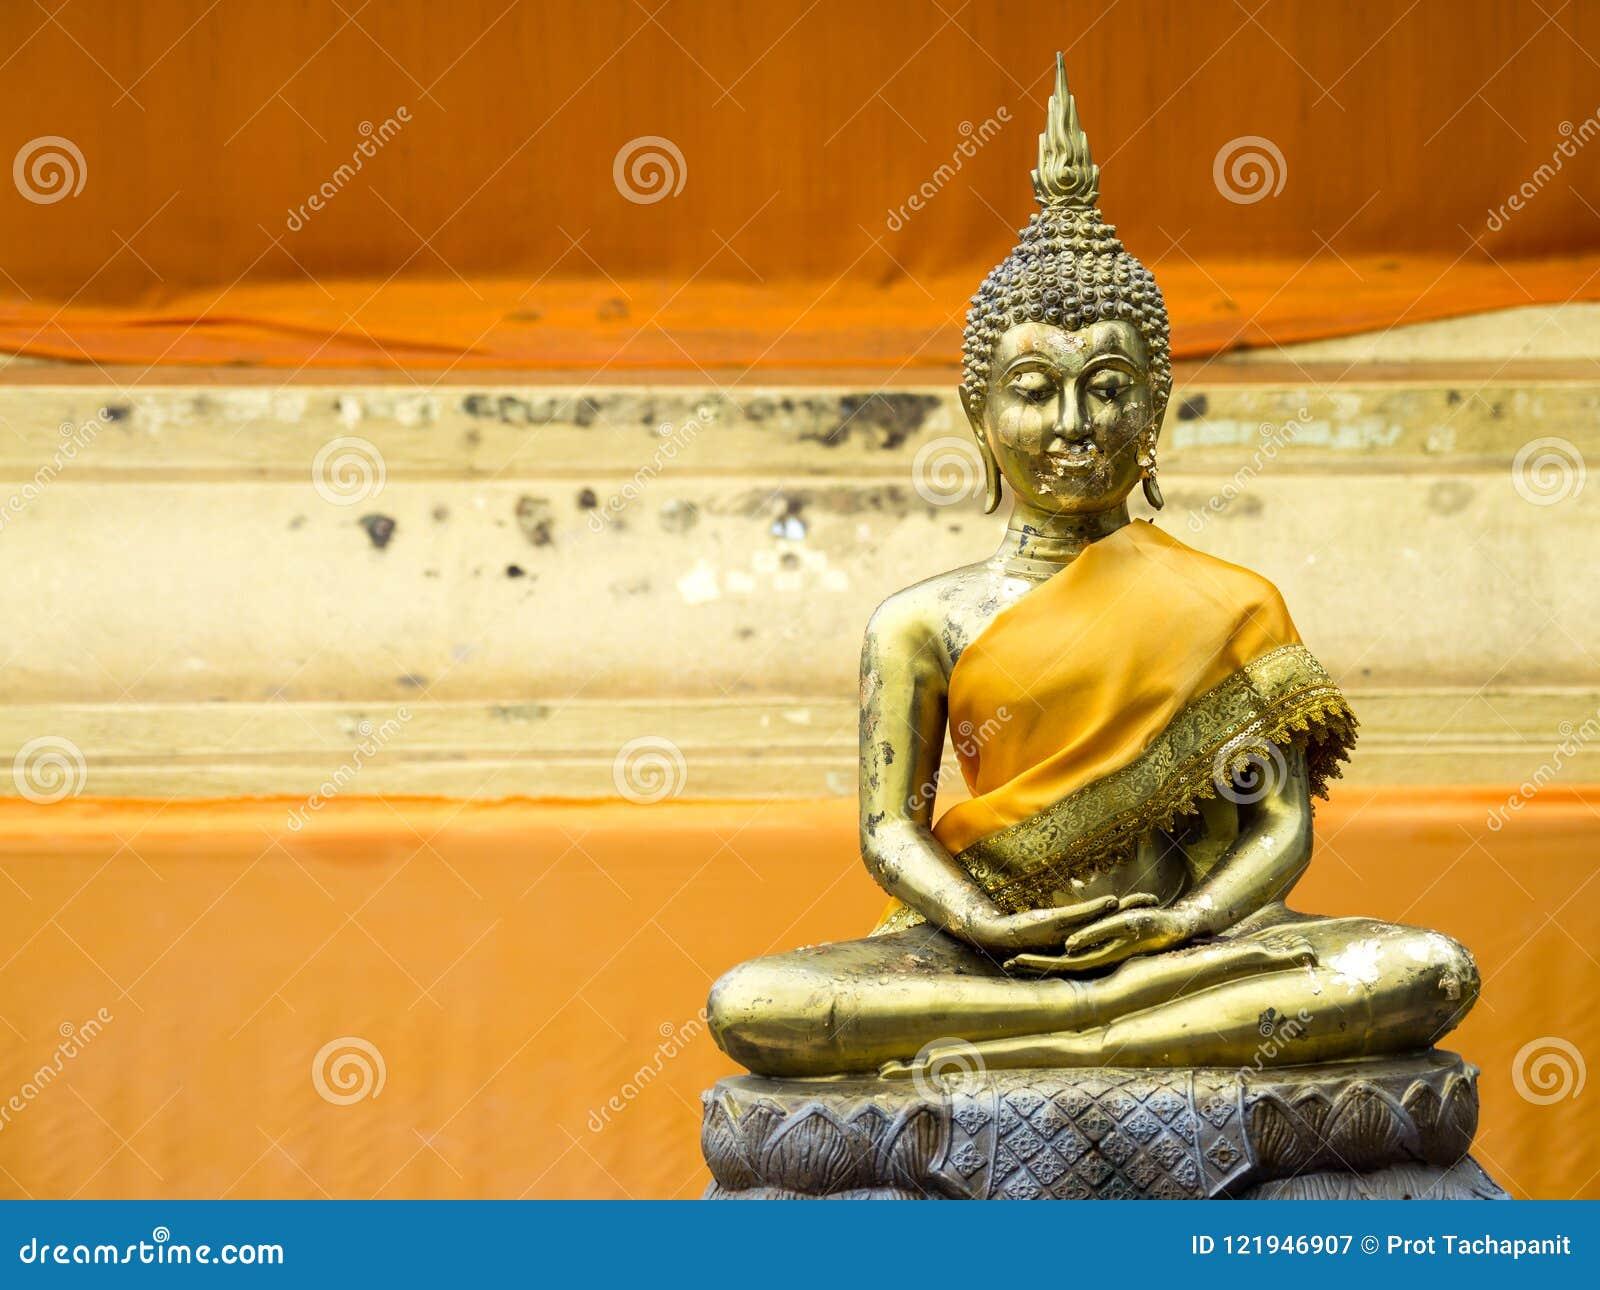 Oude Gouden Boedha in gele robes in Thailand